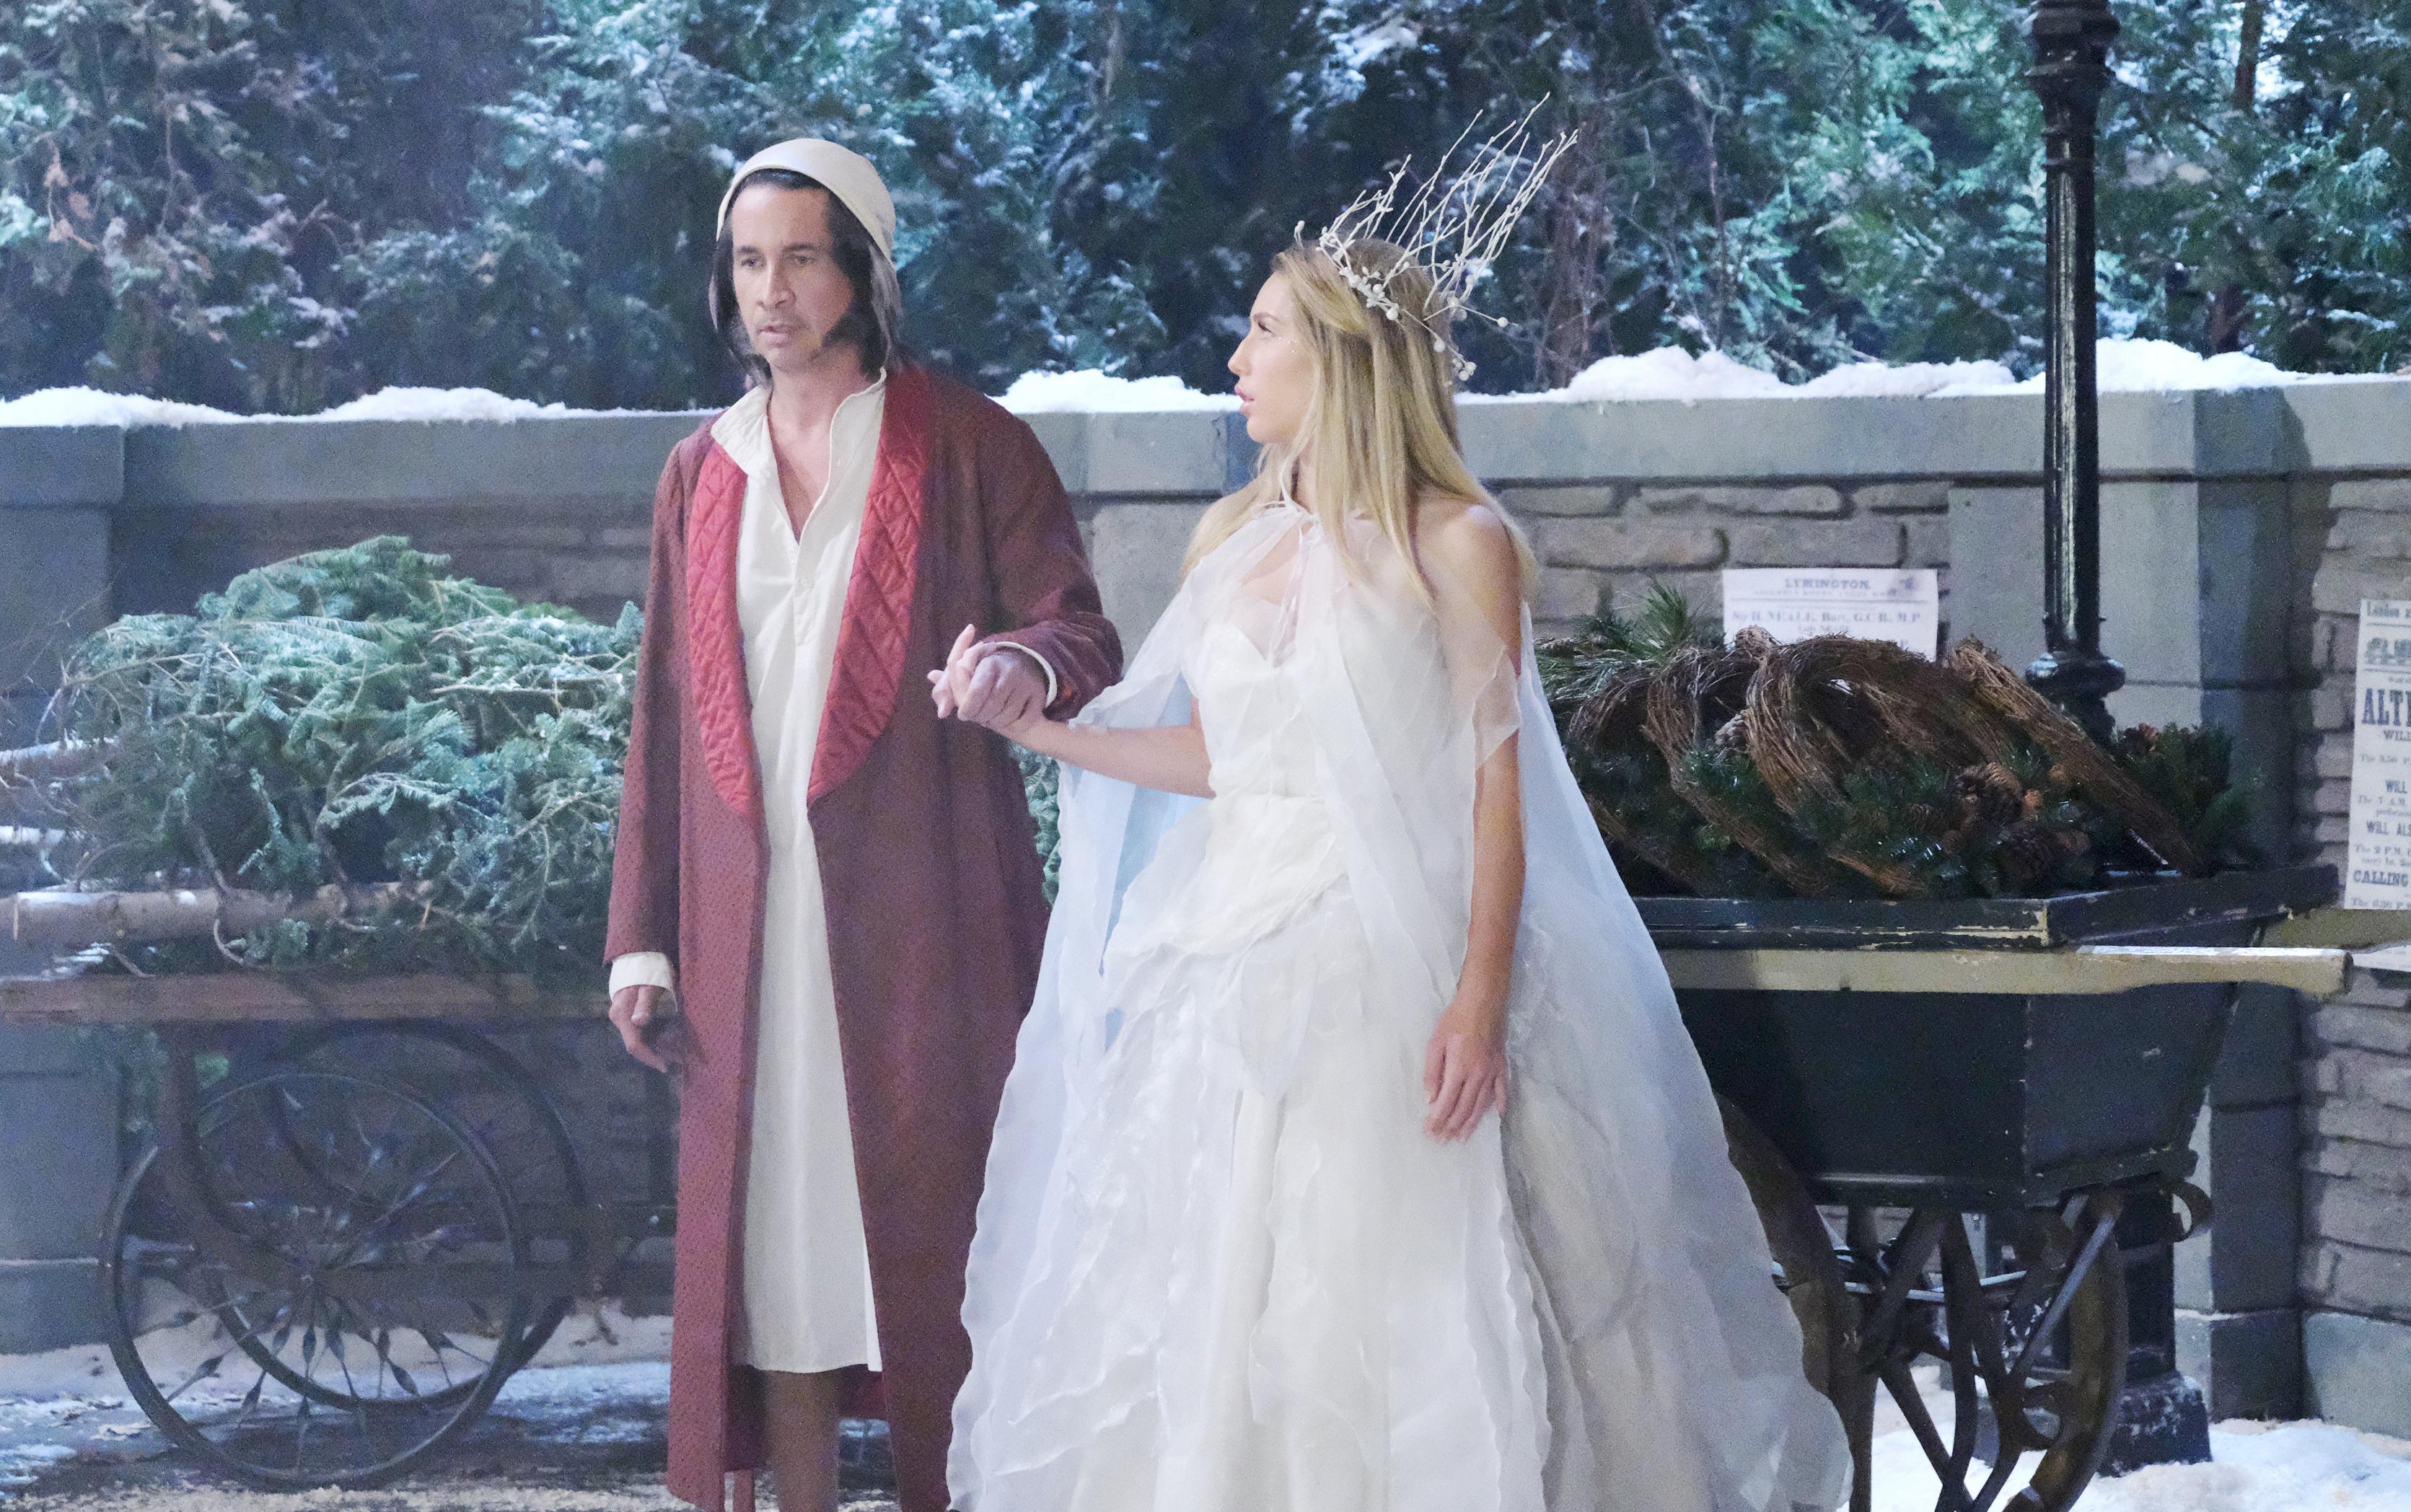 Michael Easton, Eden McCoy General Hospital Ebenezer Scrooge A Christmas Carol episode